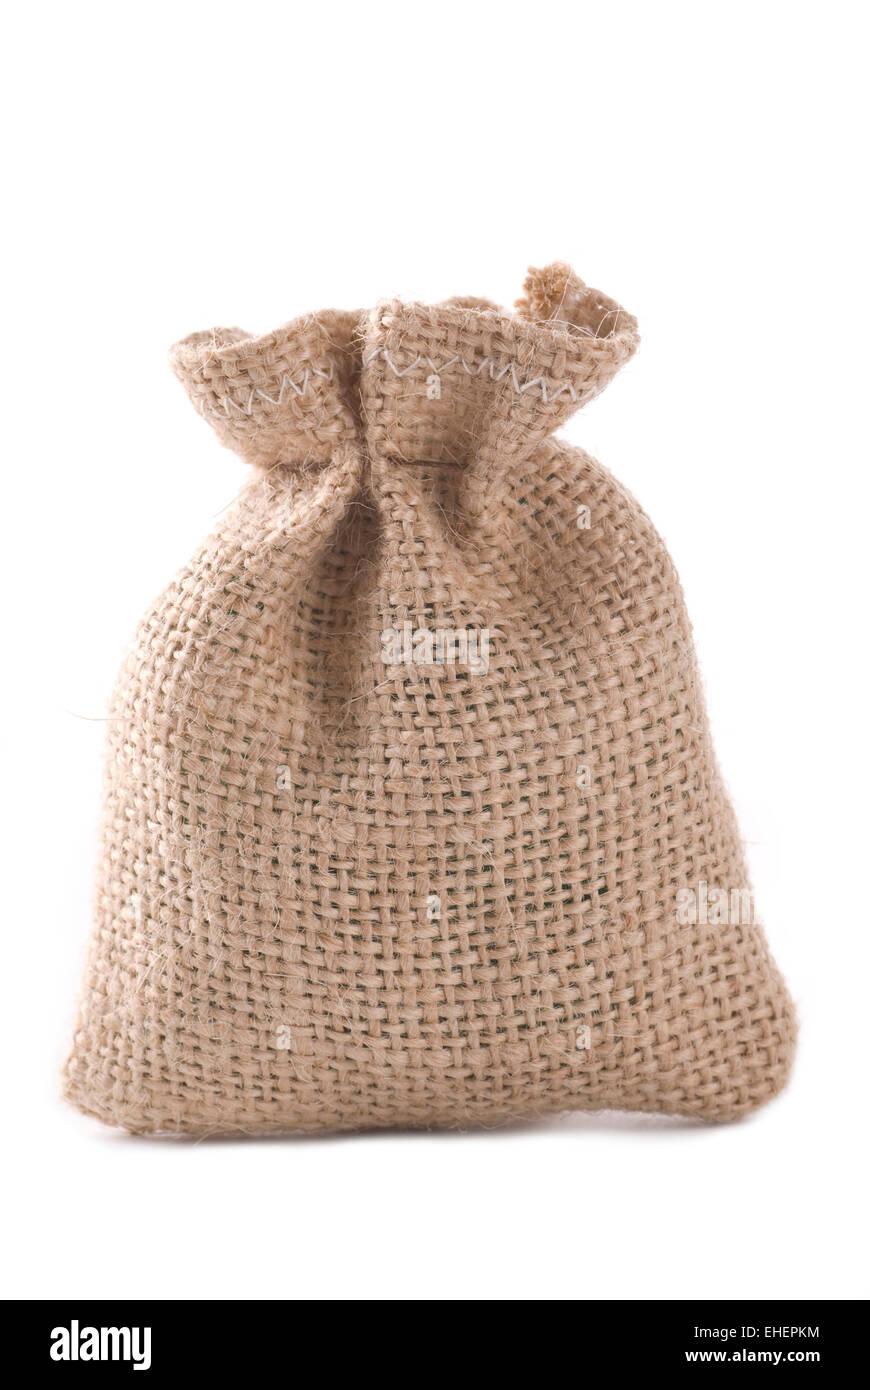 Tied sack made of burlap on white background. - Stock Image